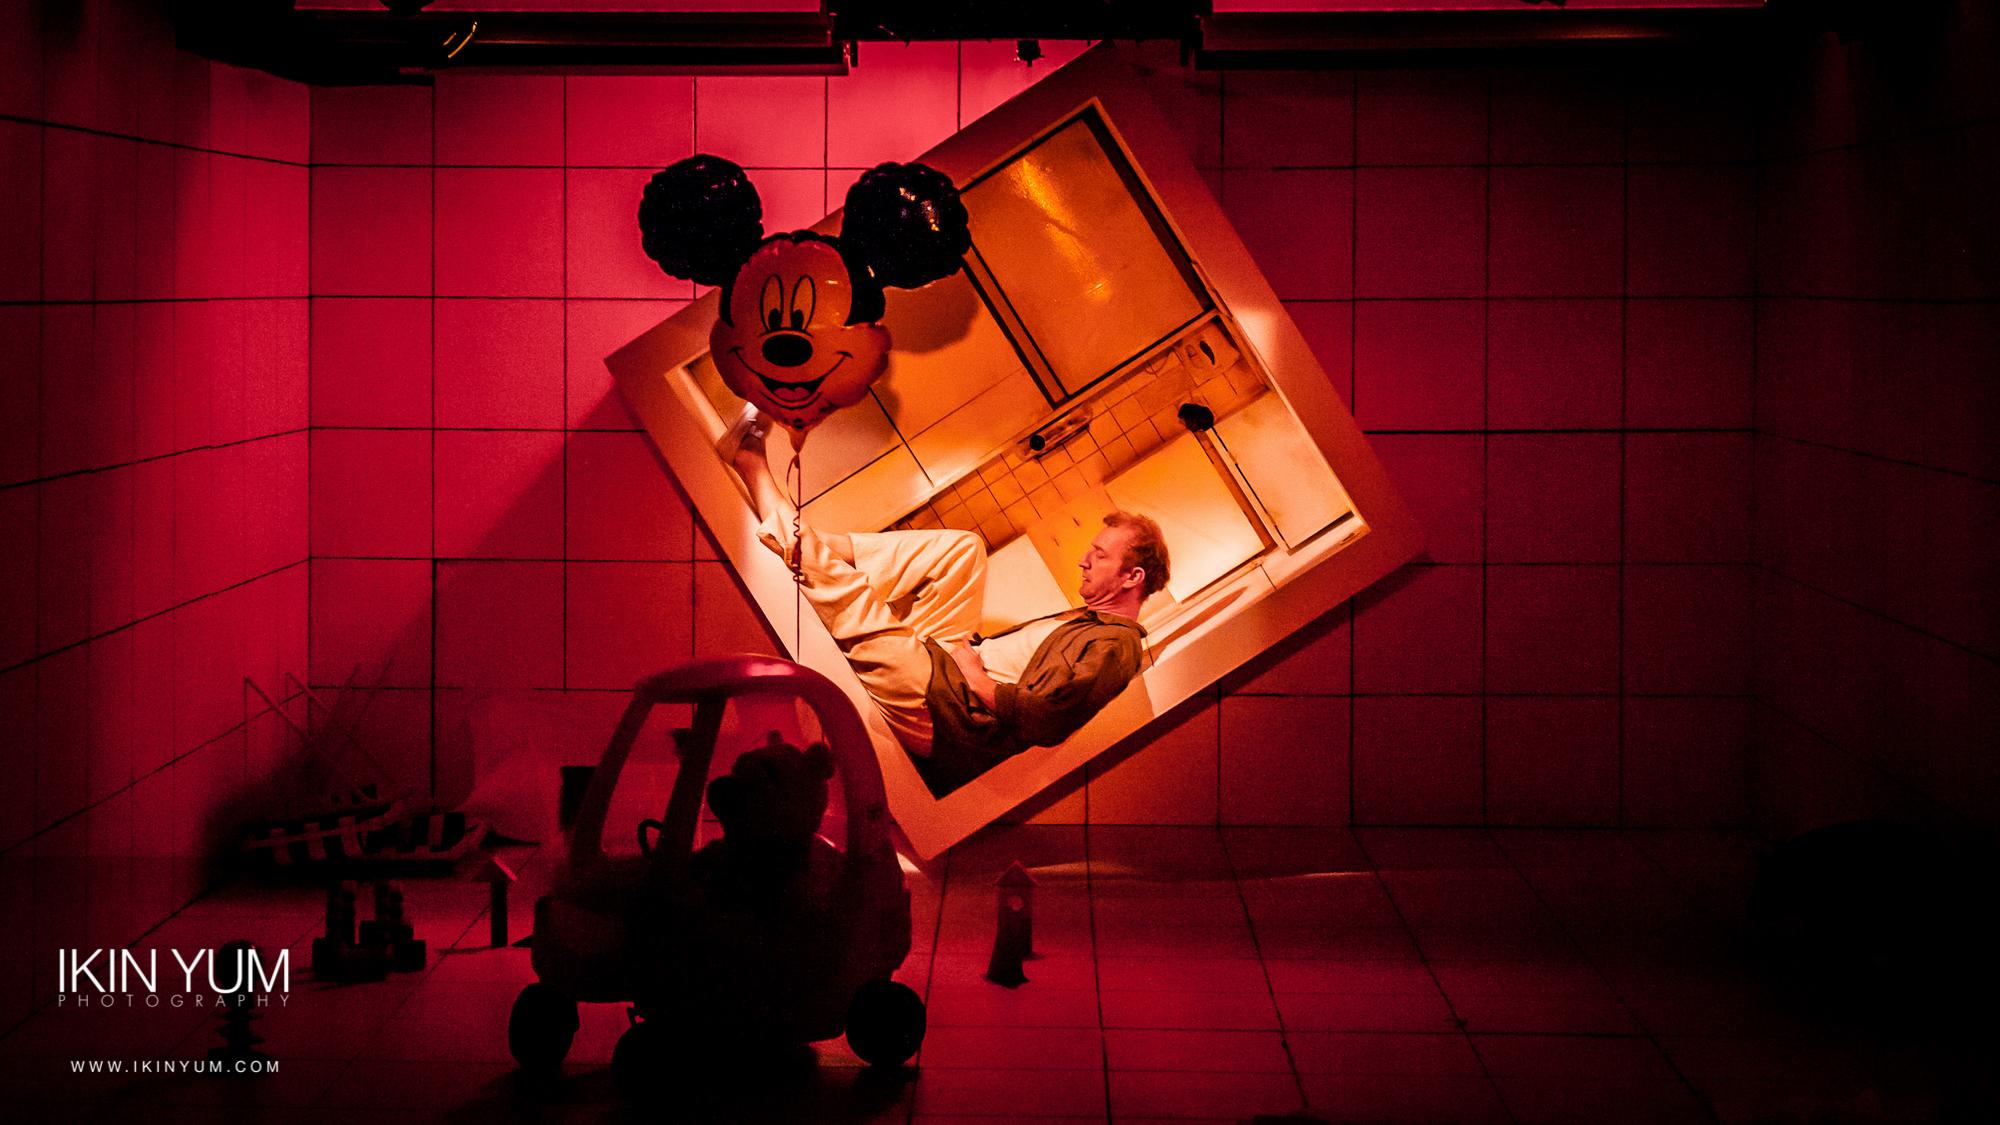 Goya - Gate theatre - Ikin Yum Photography-063.jpg